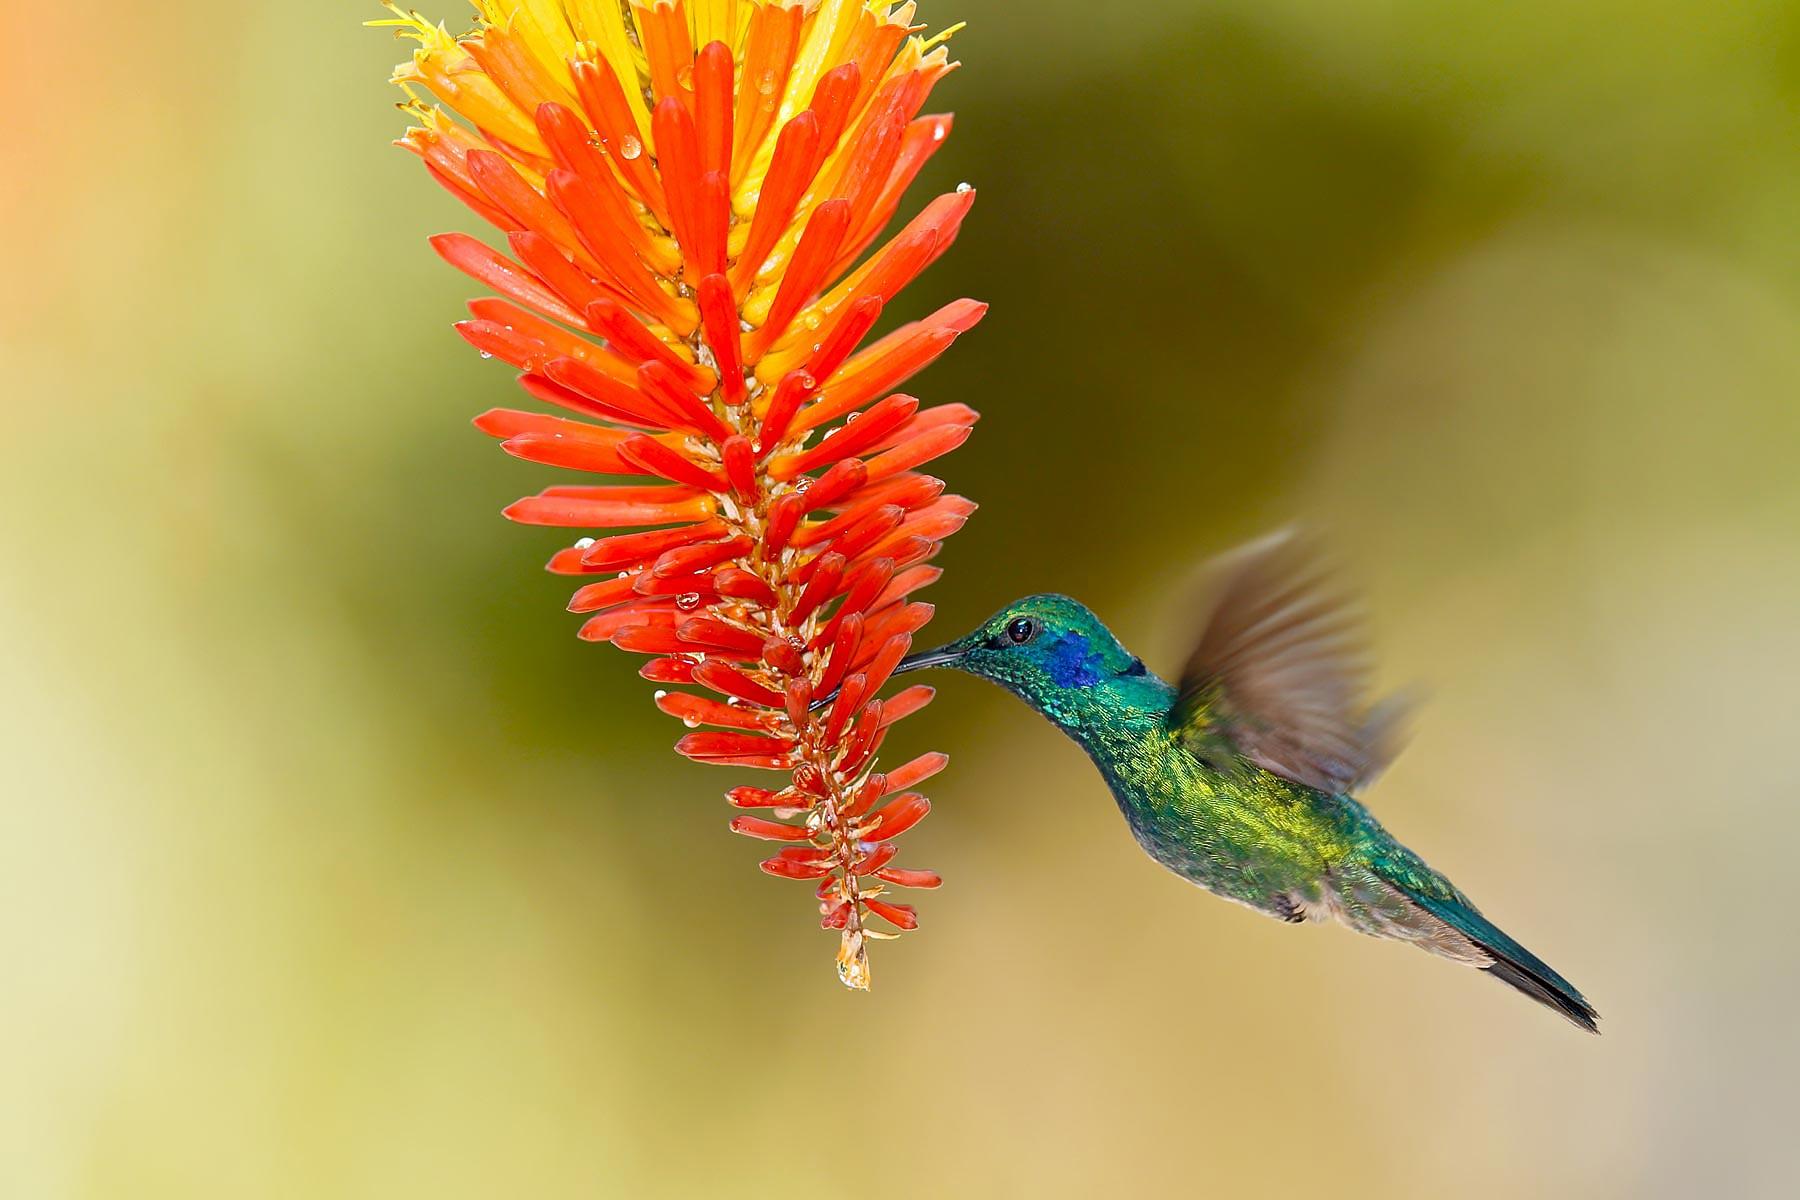 Green Violet-Ear Hummingbird / Groene violetoorkolibrie @ Costa Rica